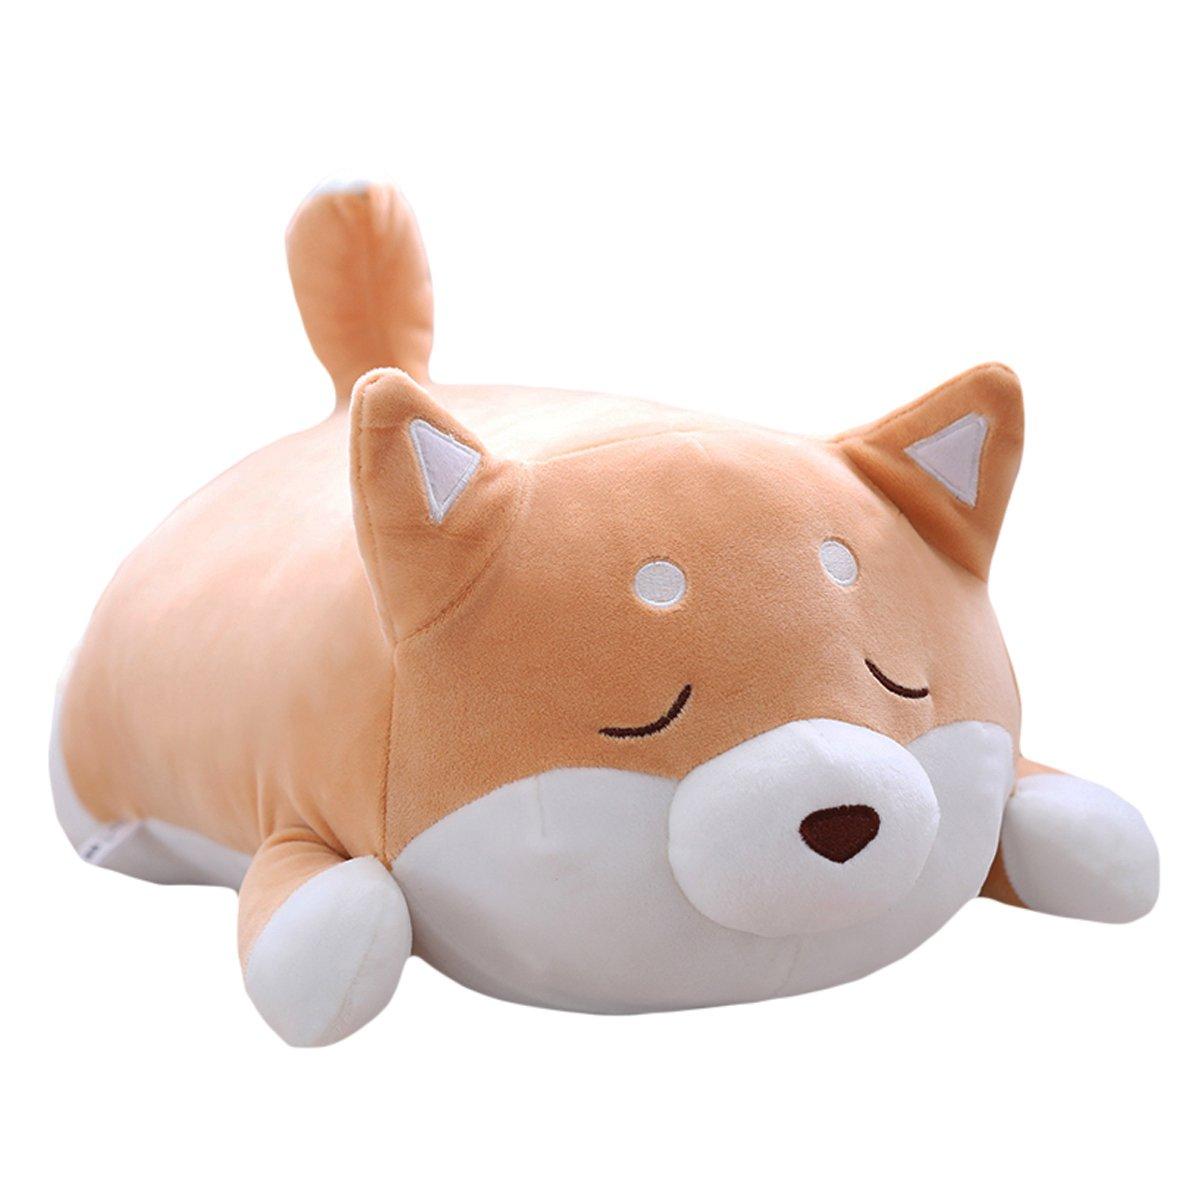 Cute Corgi Akita Stuffed Animals Doll Toy Gifts for Valentines Gift Christmas,Sofa Chair Brown Round Eye Levenkeness Shiba Inu Dog Plush Pillow 15